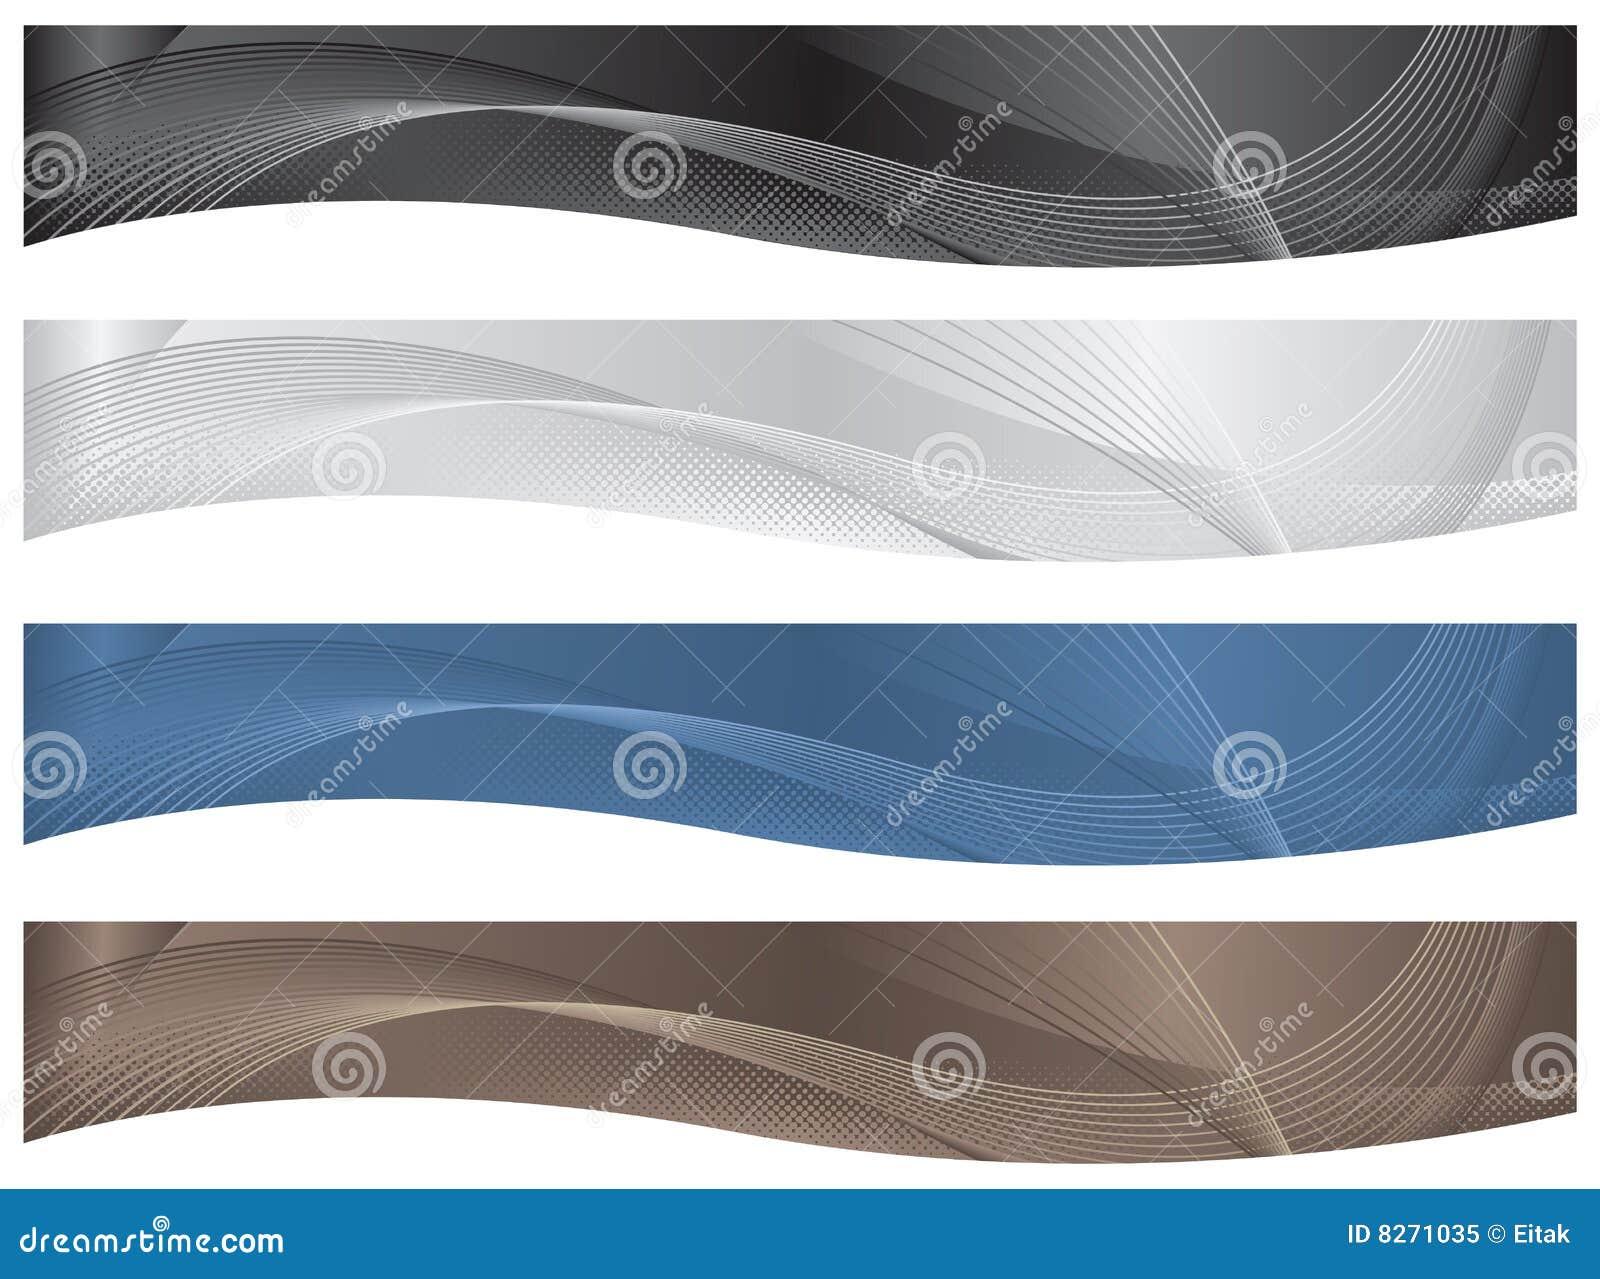 Wavy Headers/Banners - Neutrals